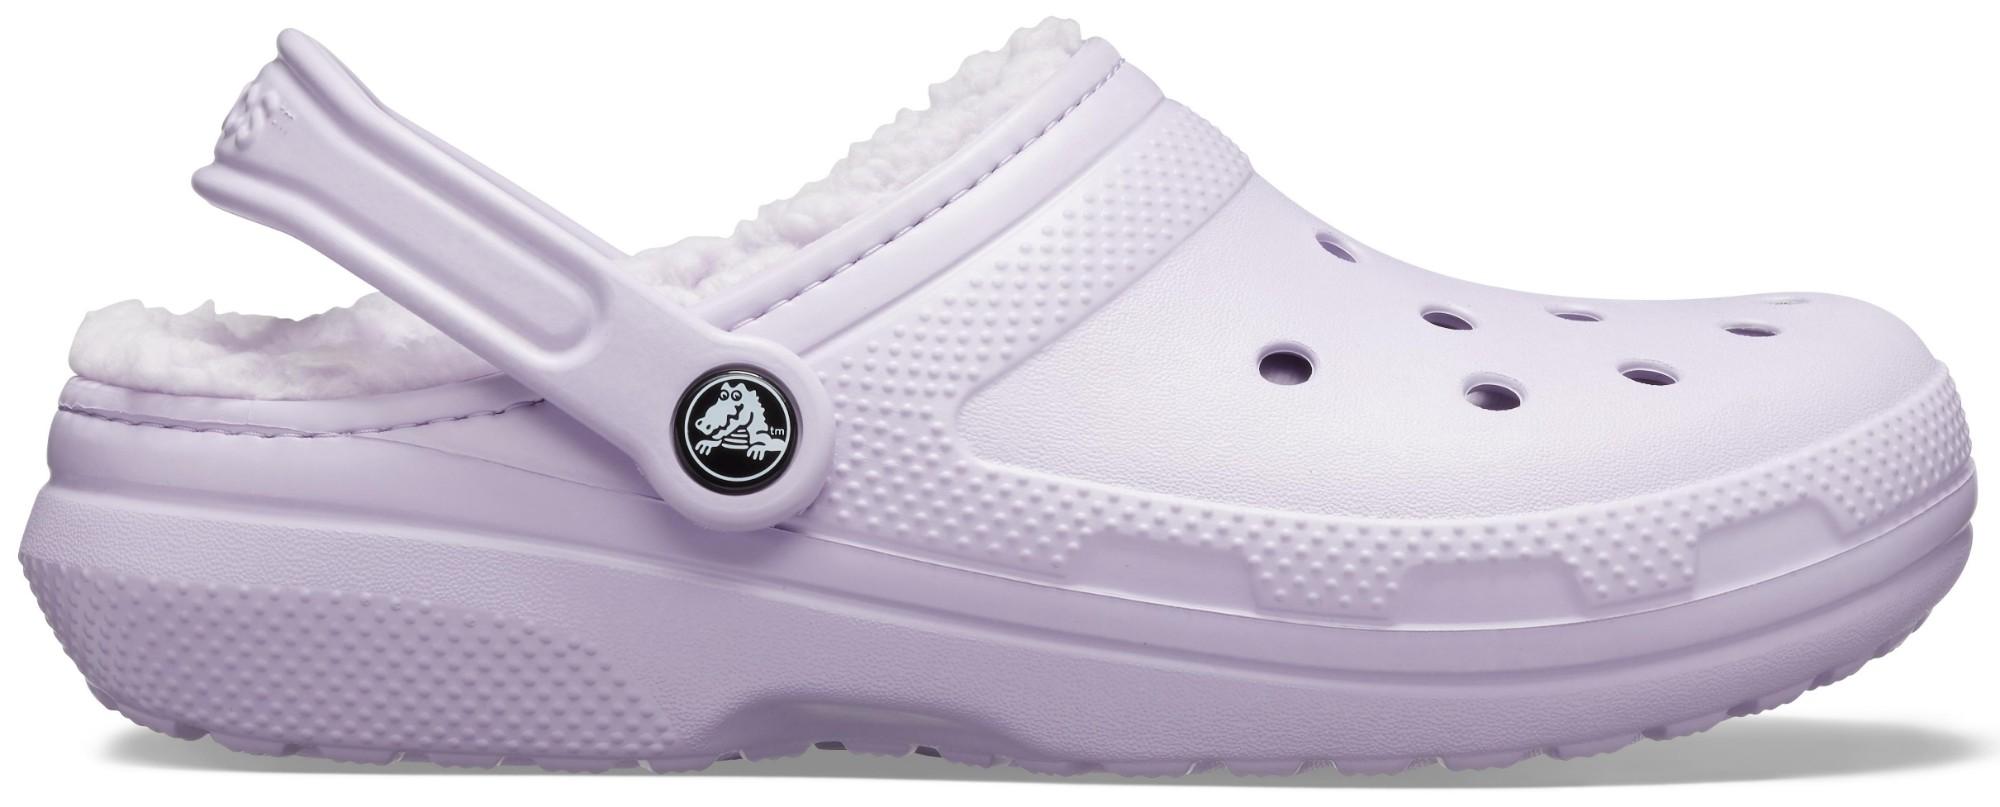 Crocs™ Classic Lined Clog Lavender/Lavender 36,5